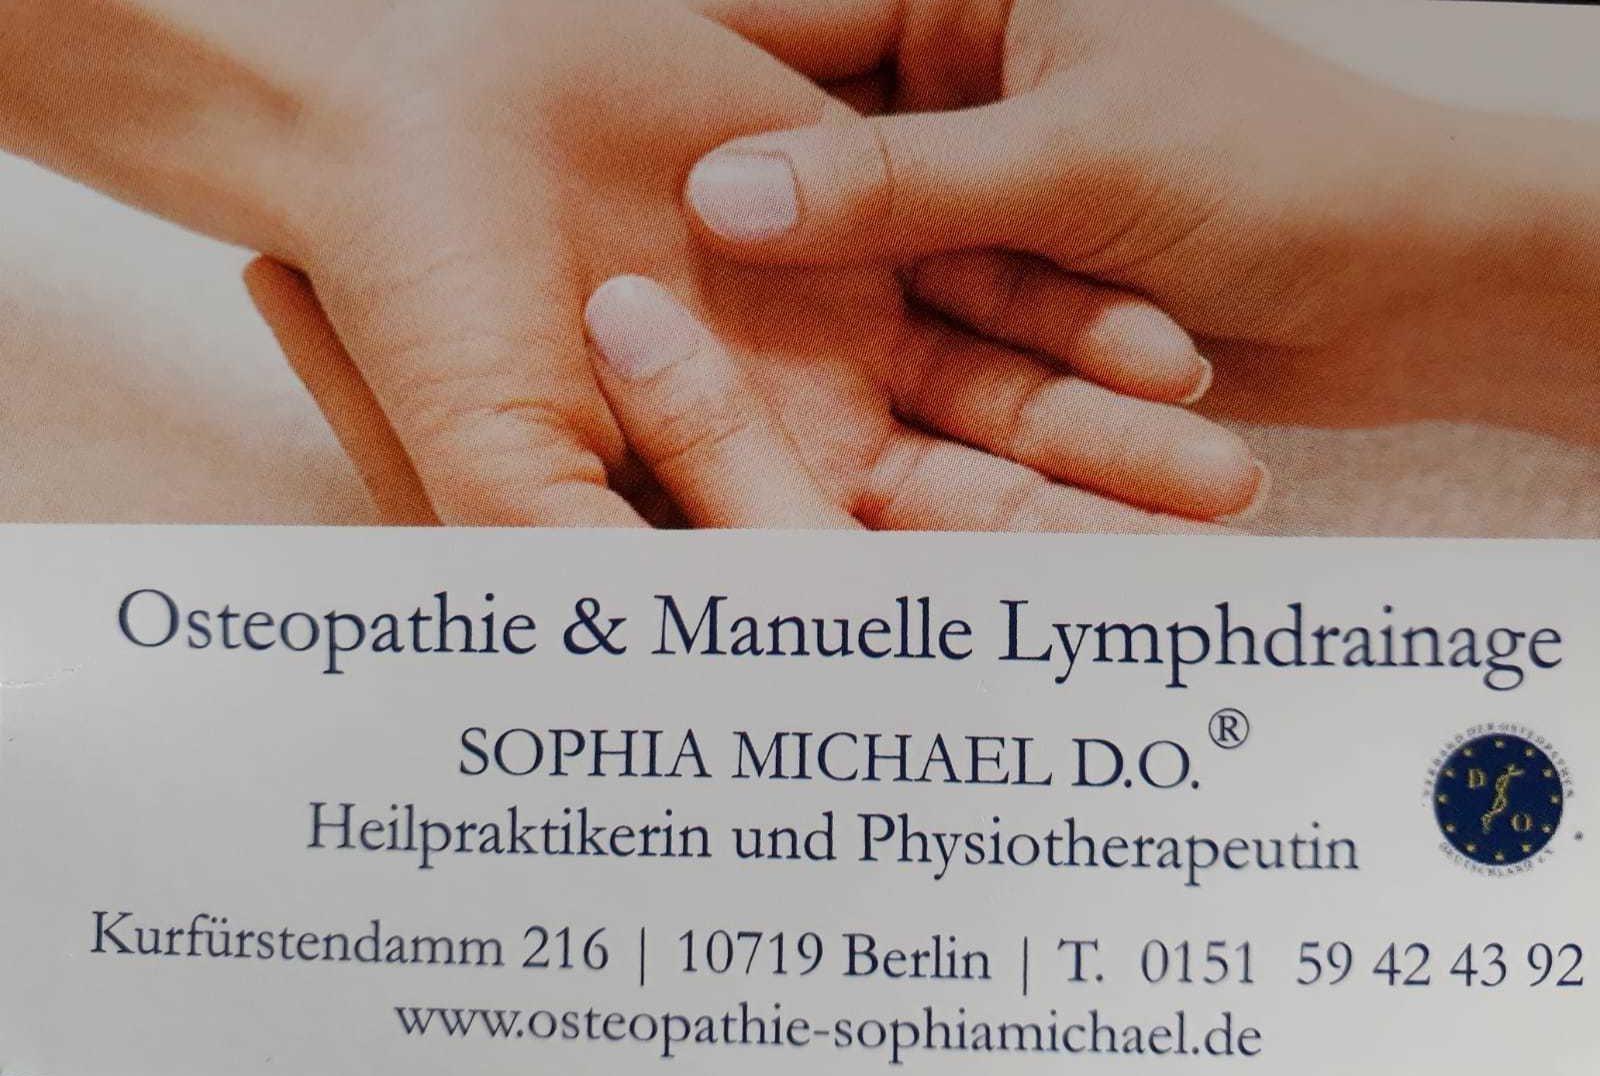 Osteopathie & Manuelle Lymphdrainage - Heilpraktikerin und Physiotherapeutin Sophia Michael D.O.